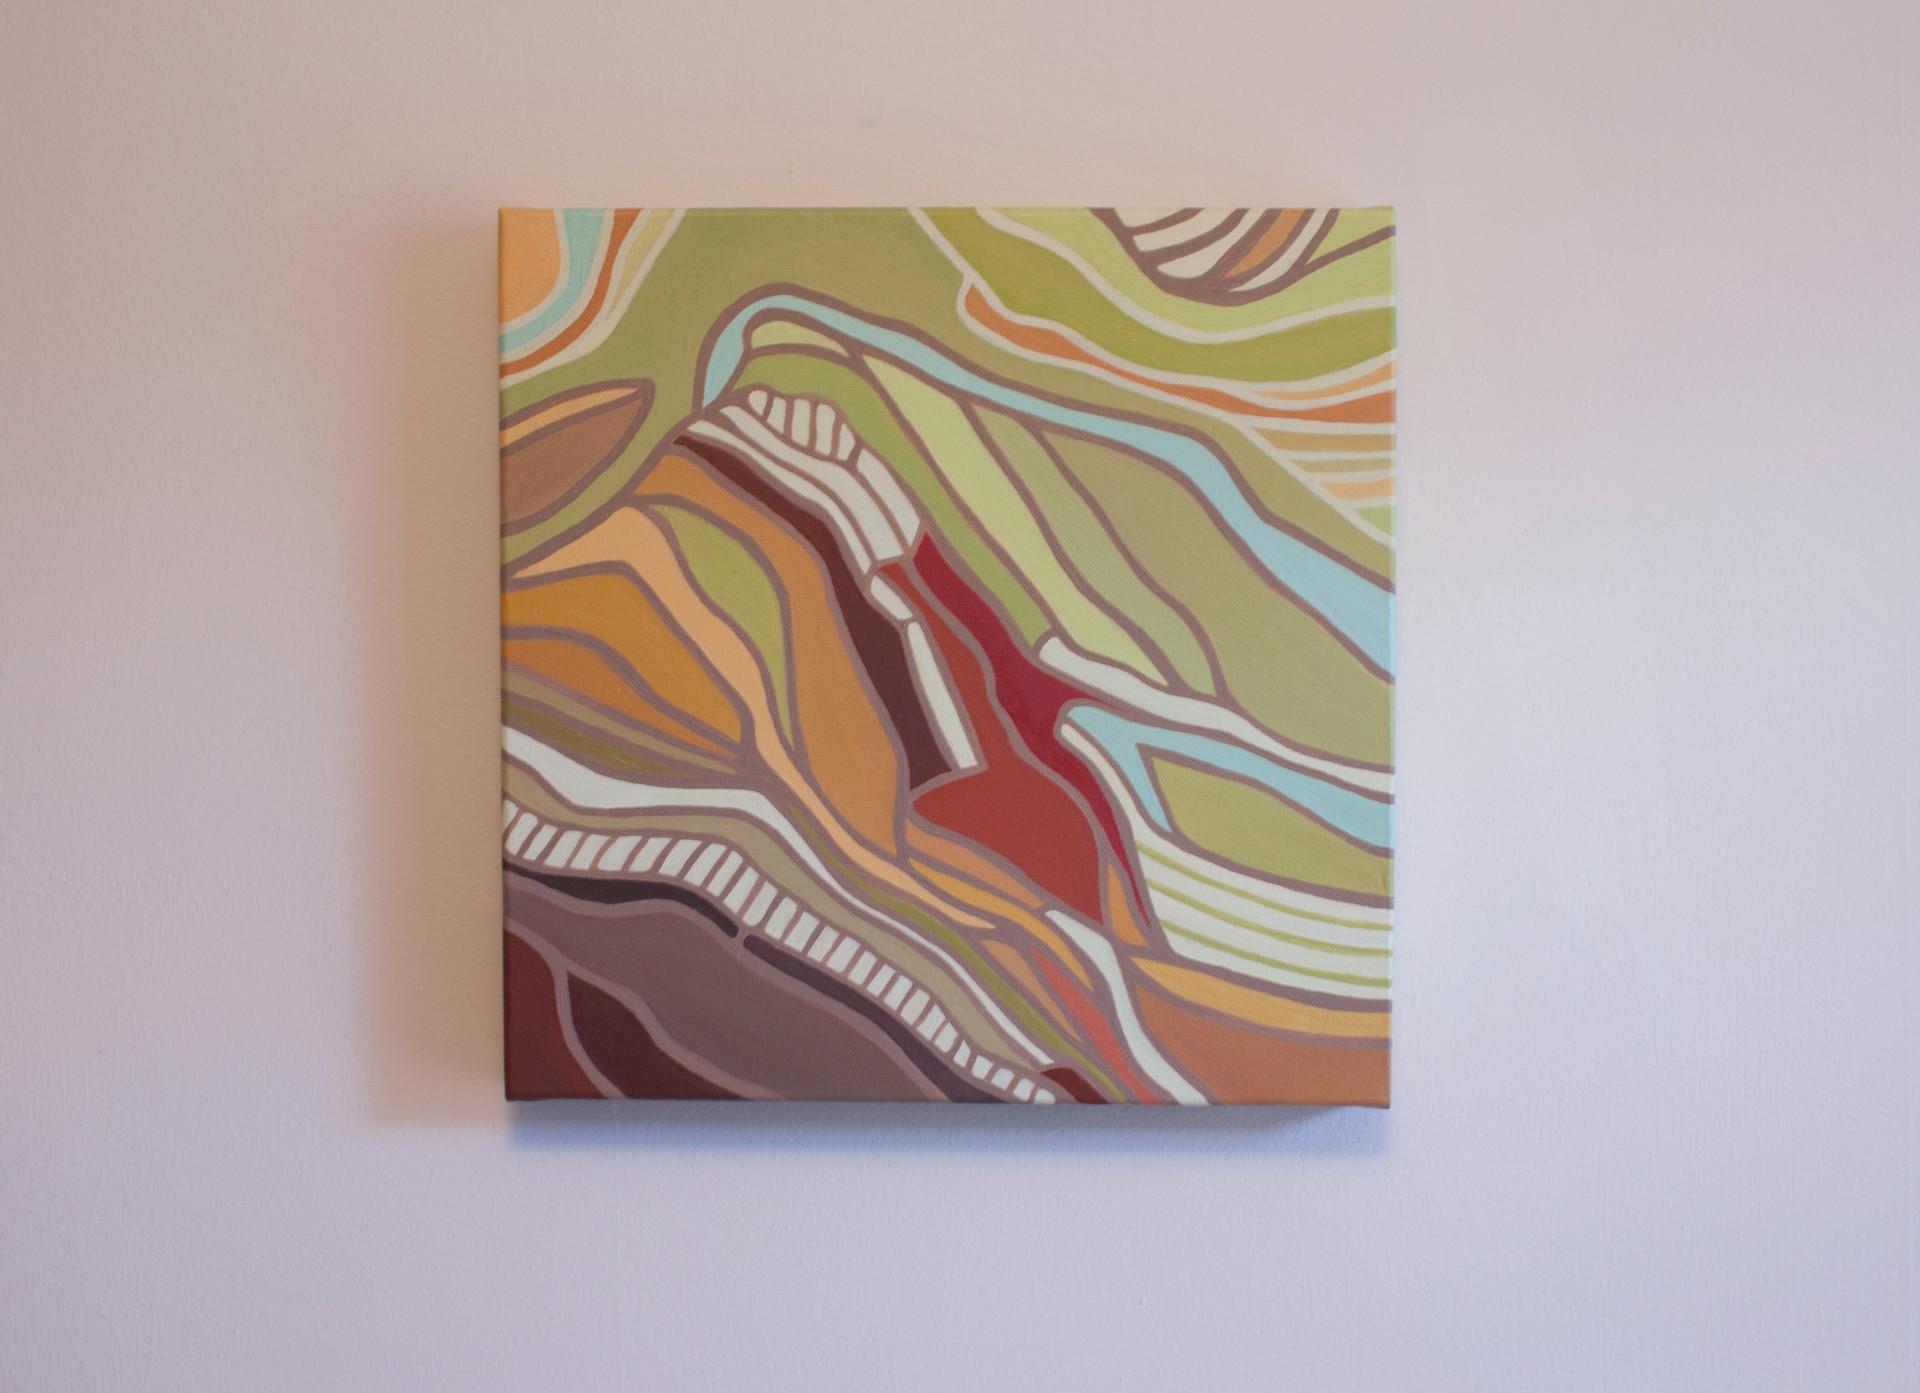 "12.00"" x 12.00"" Oil on Canvas"